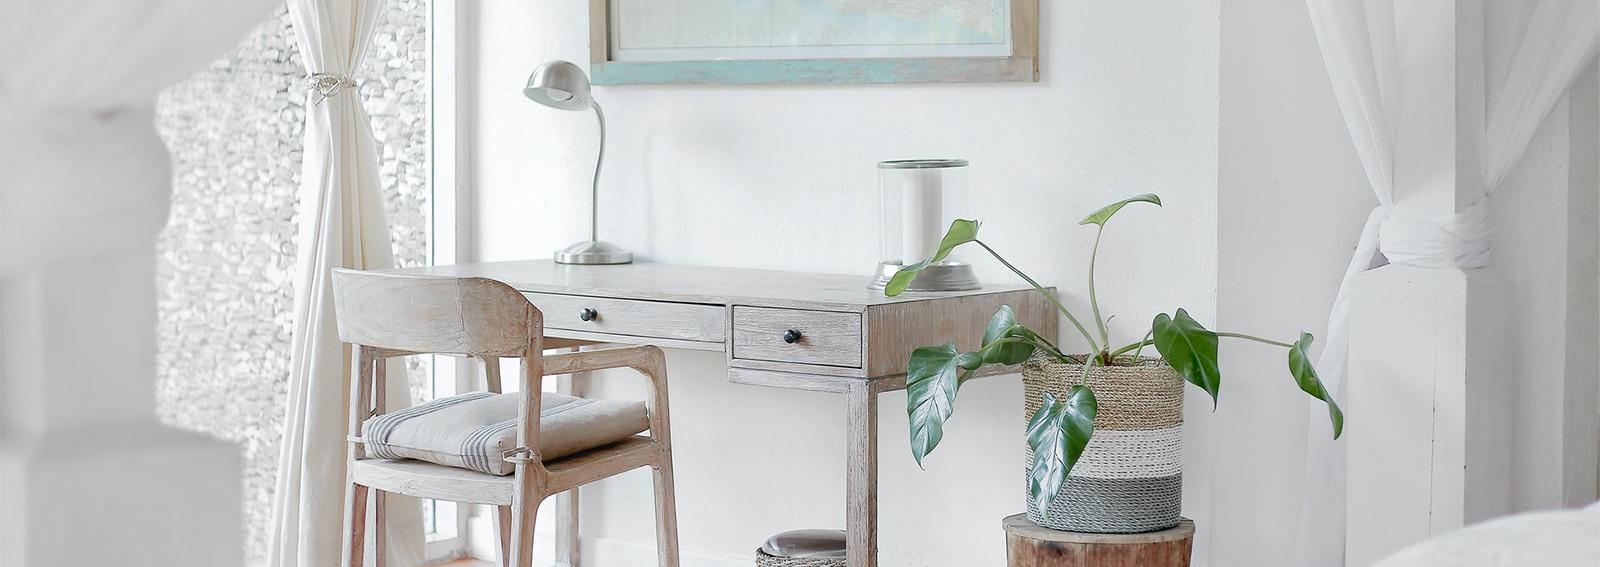 casa luminosa consigli arredamento cover desktop